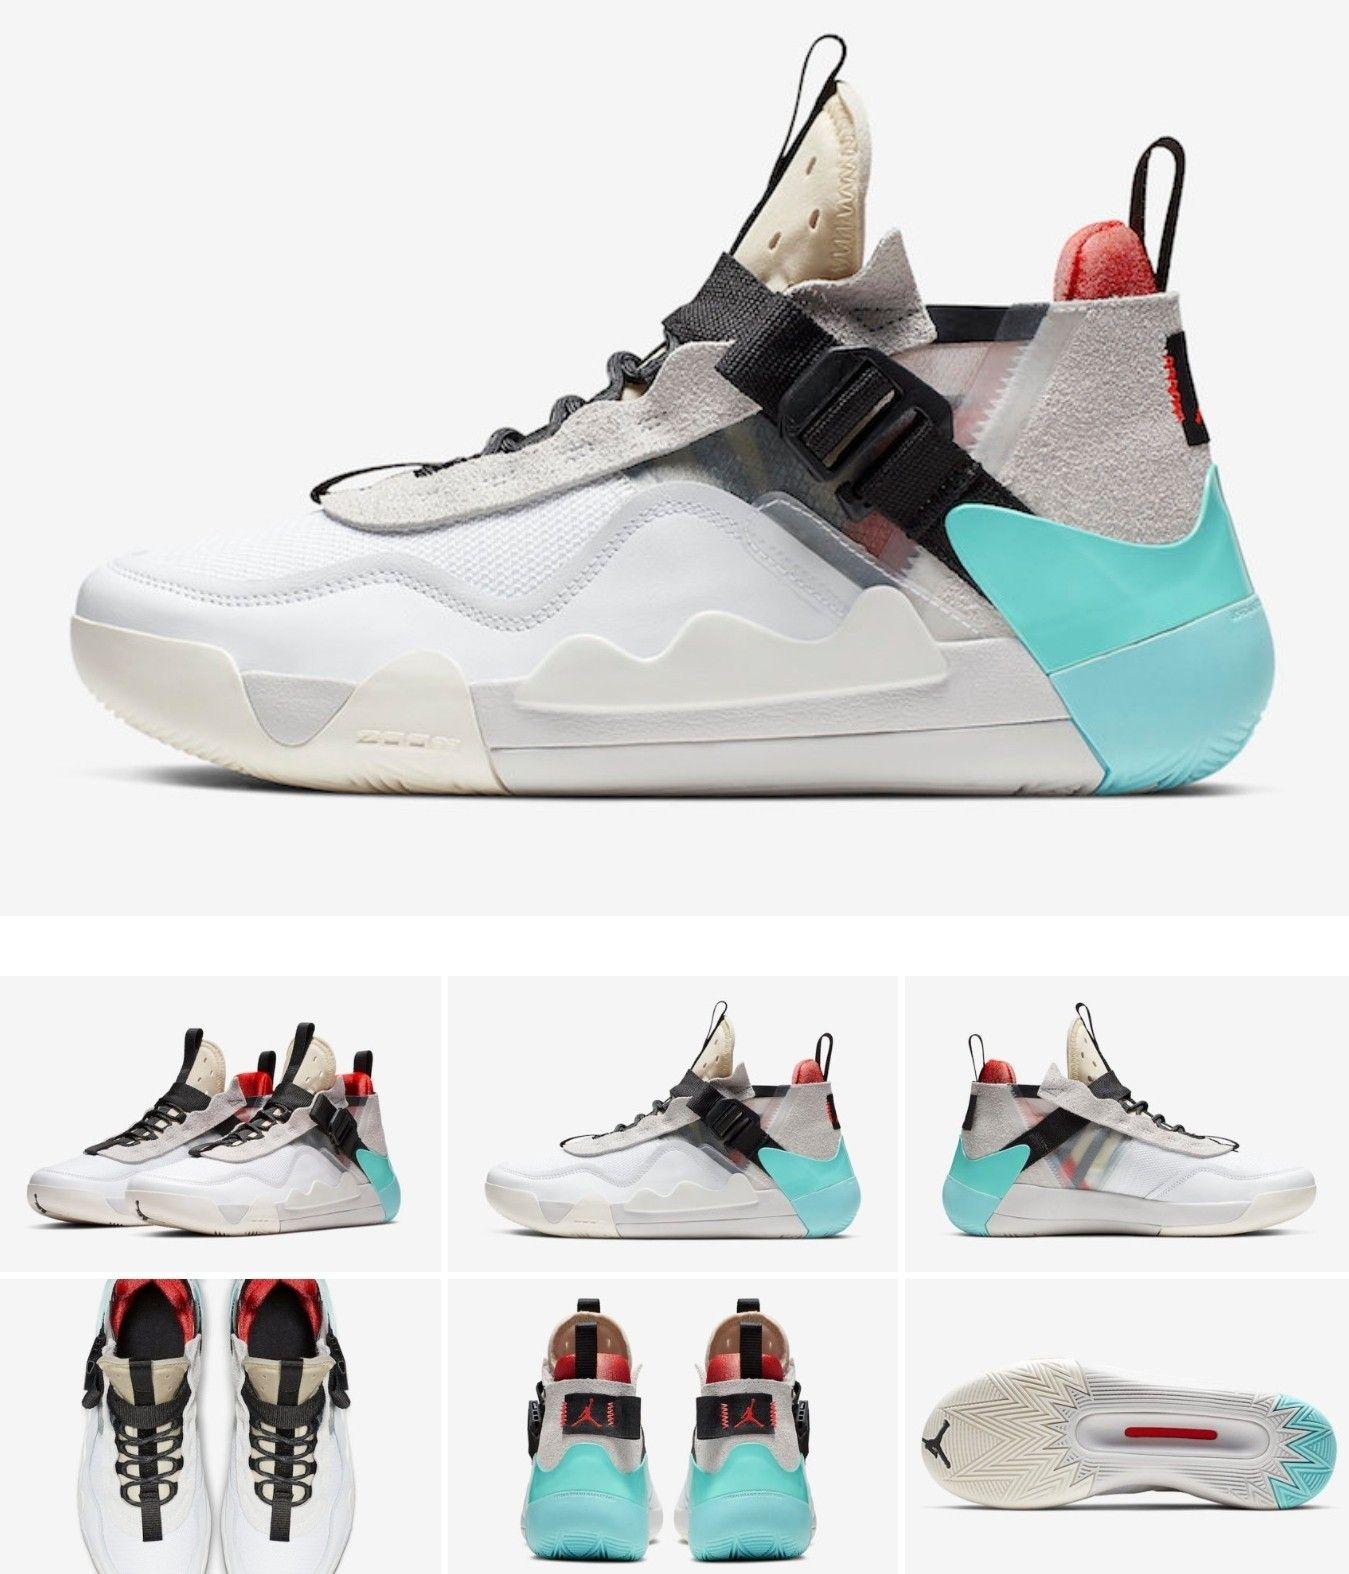 Jordan Defy SP Sneakers, Nike air jordans, Air jordans